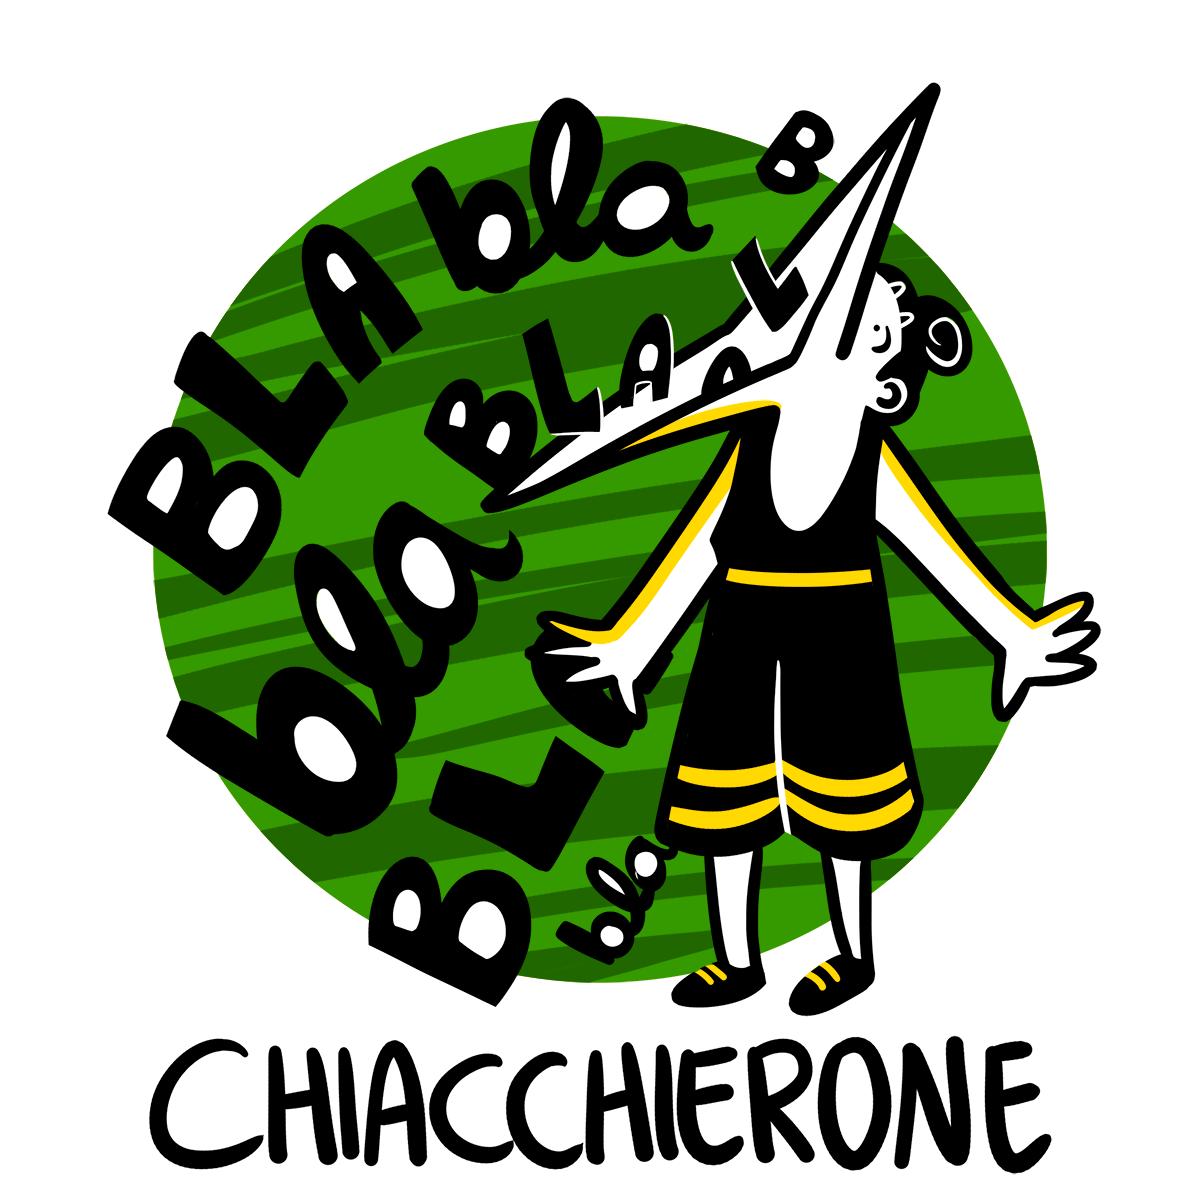 Chiacchierone